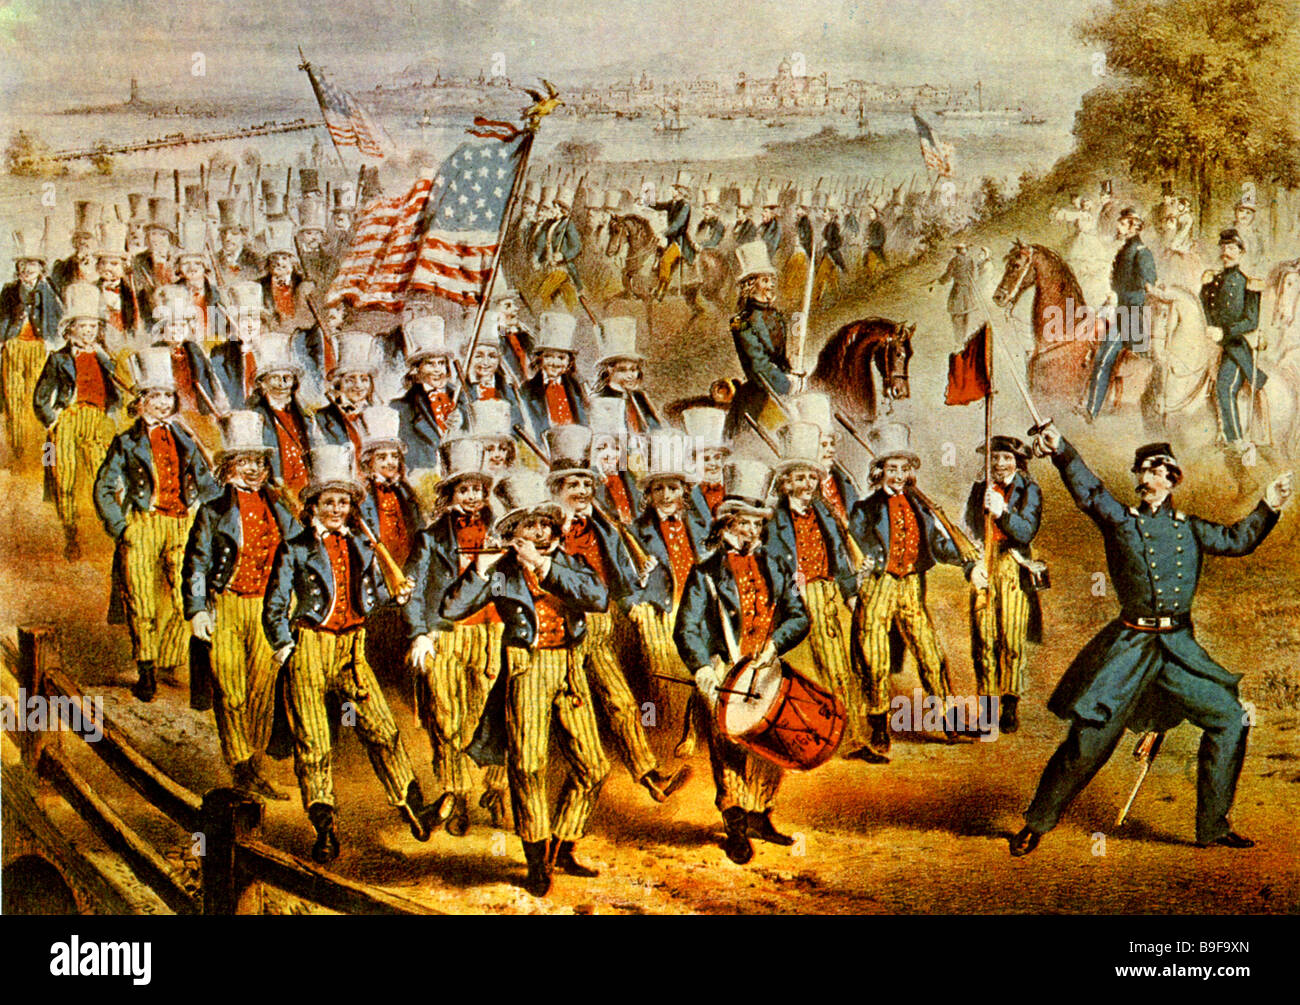 Yankee Civil War After Civil War Stock ...